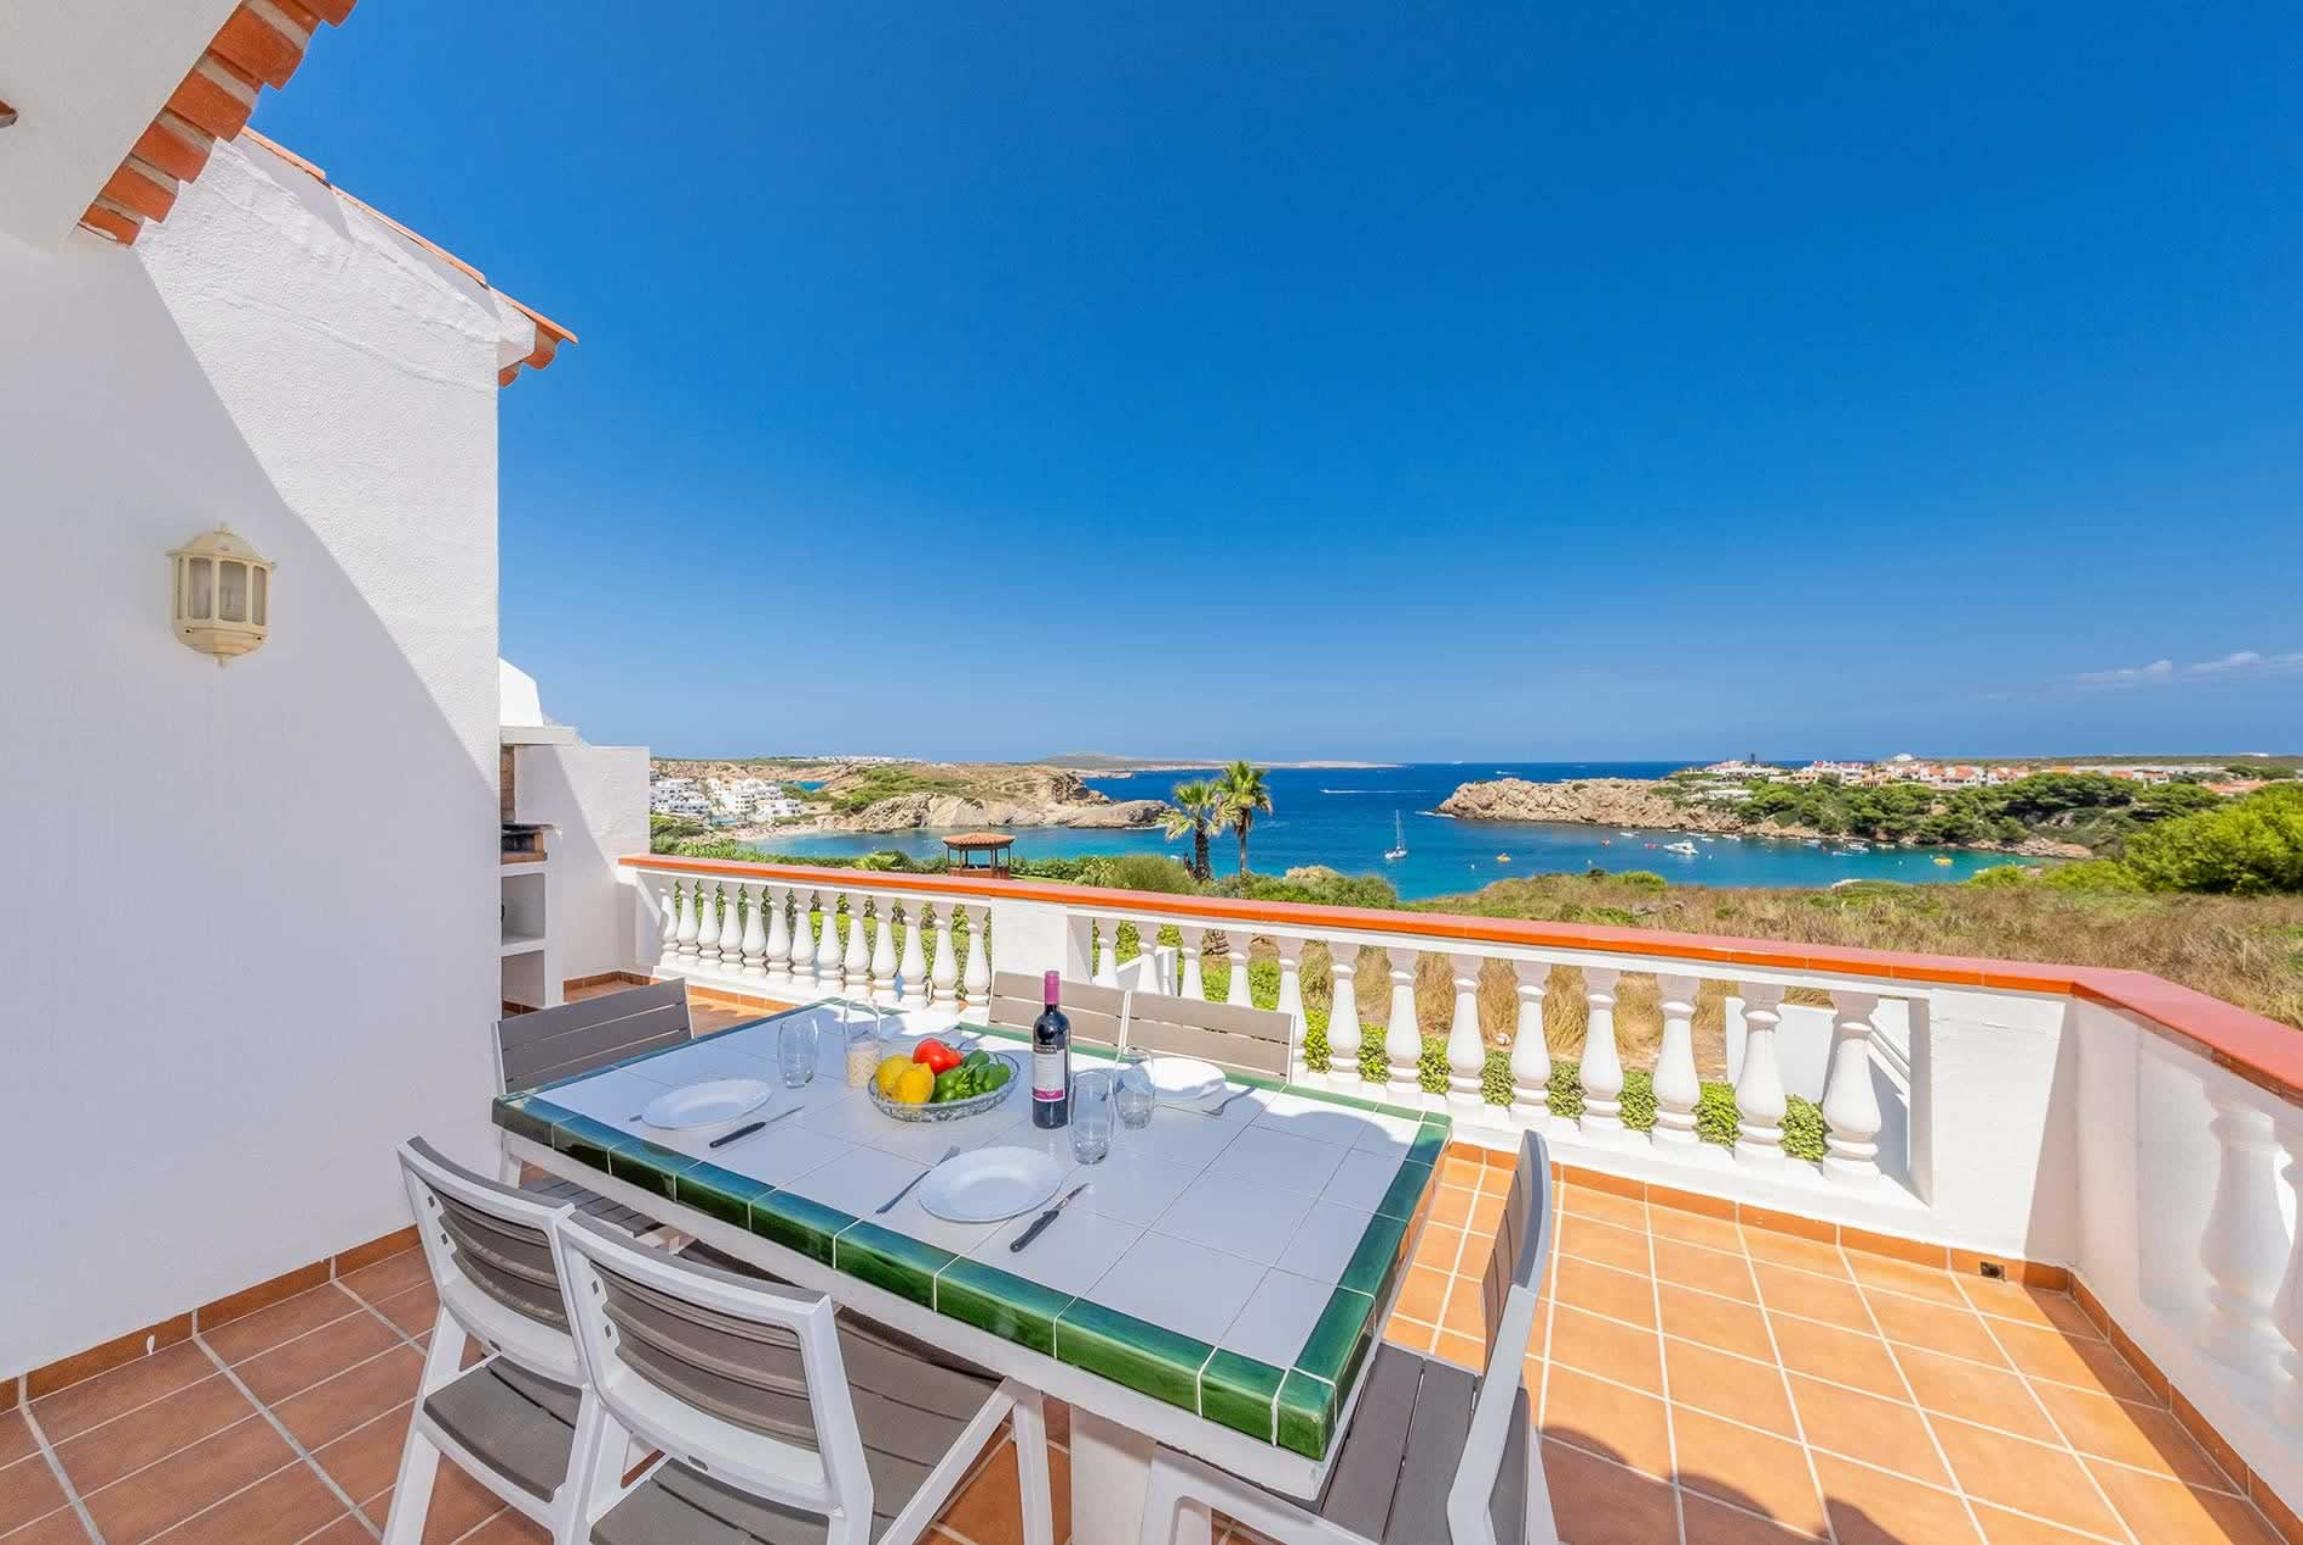 Ferienhaus Bellavista II (2654270), Arenal De'N Castell, Menorca, Balearische Inseln, Spanien, Bild 6